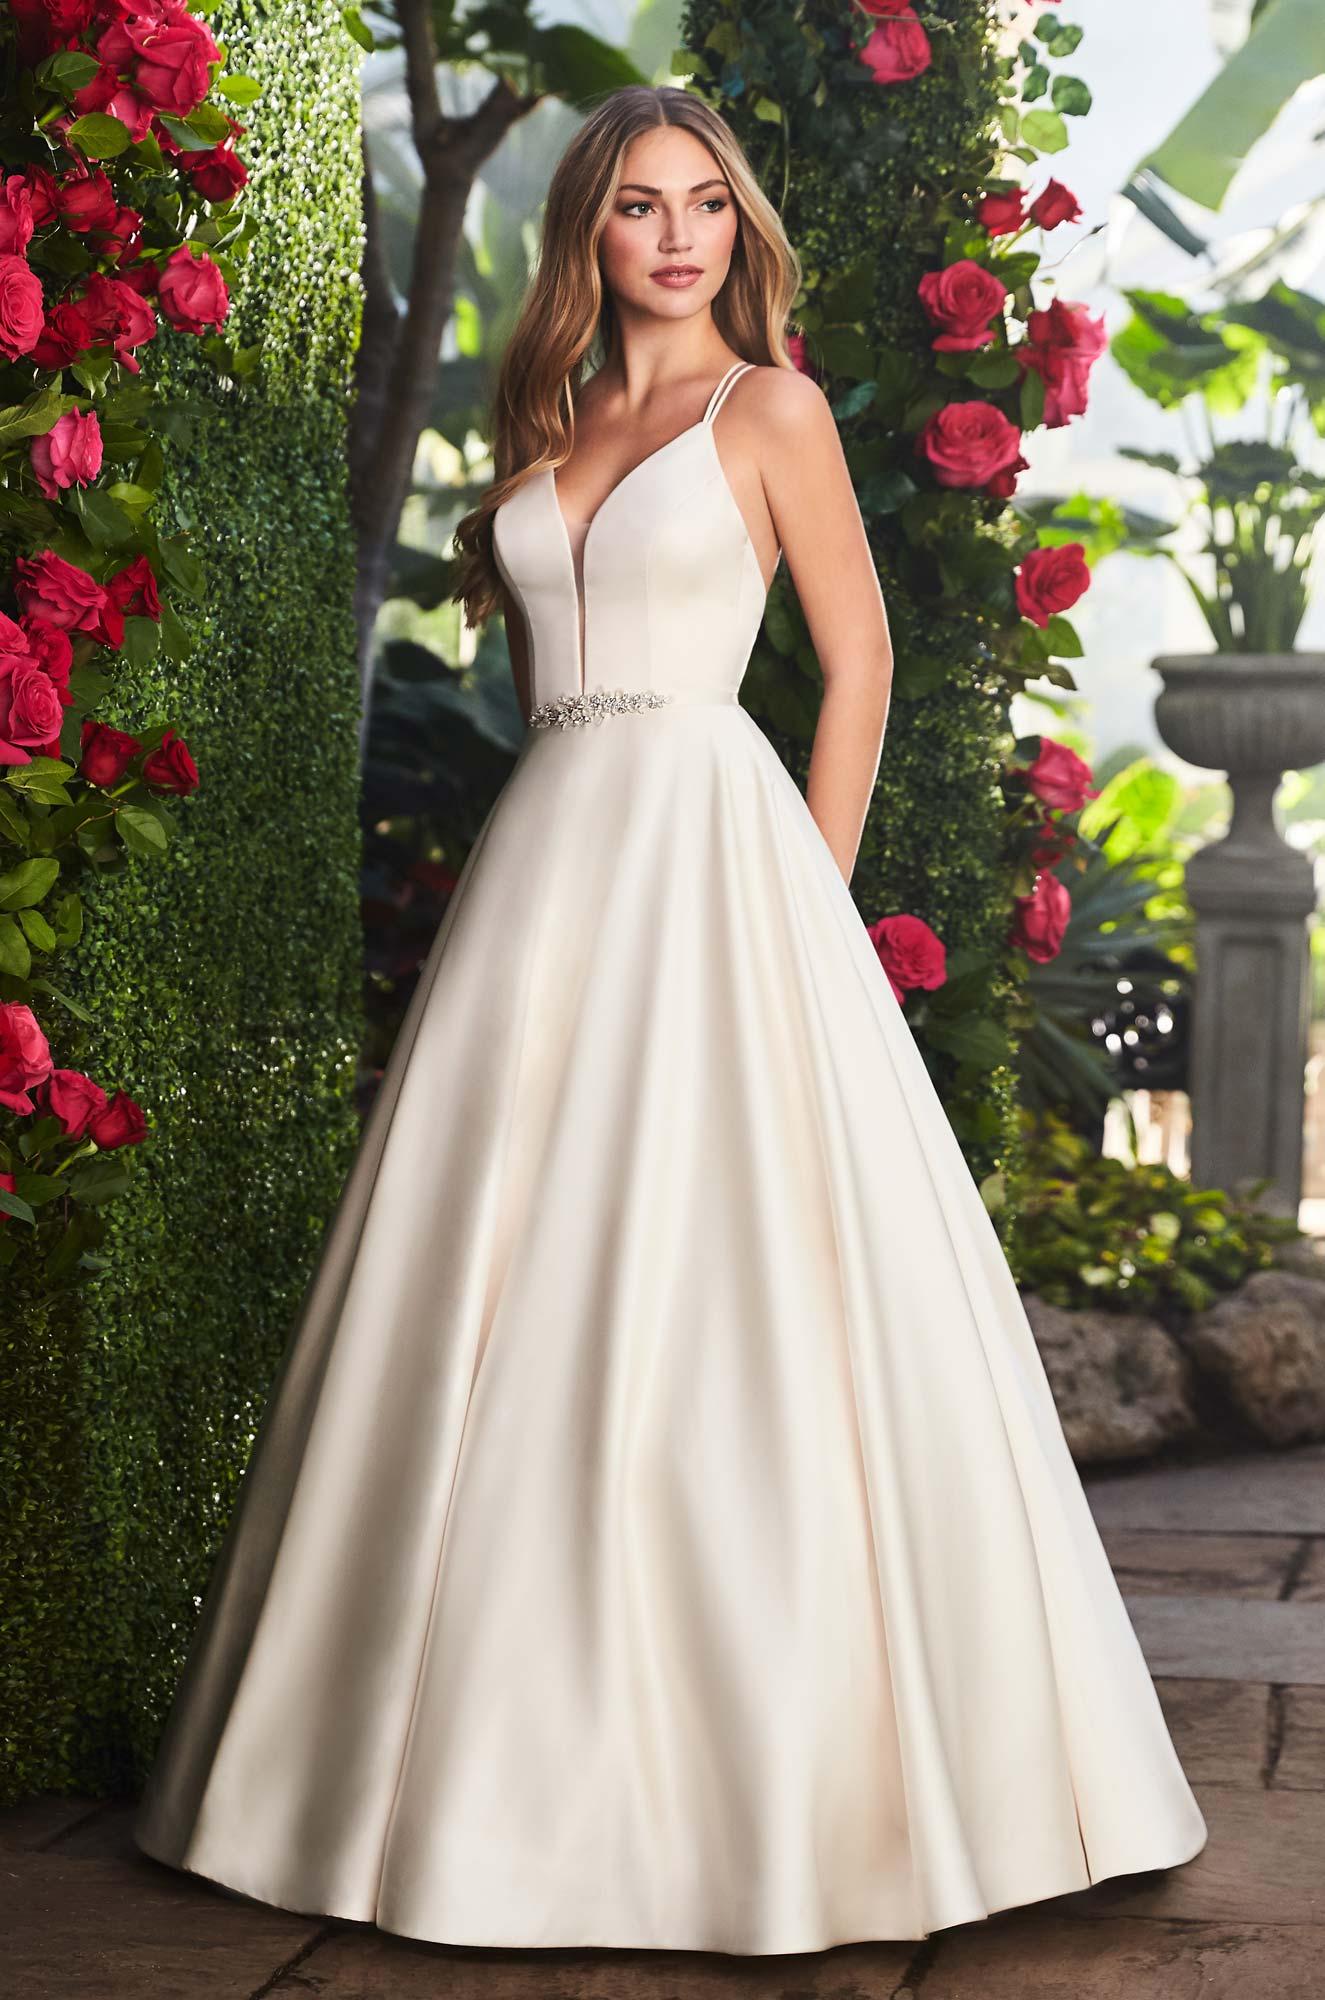 Spaghetti Strap V-neckline Satin A-line Wedding Gown With Belt